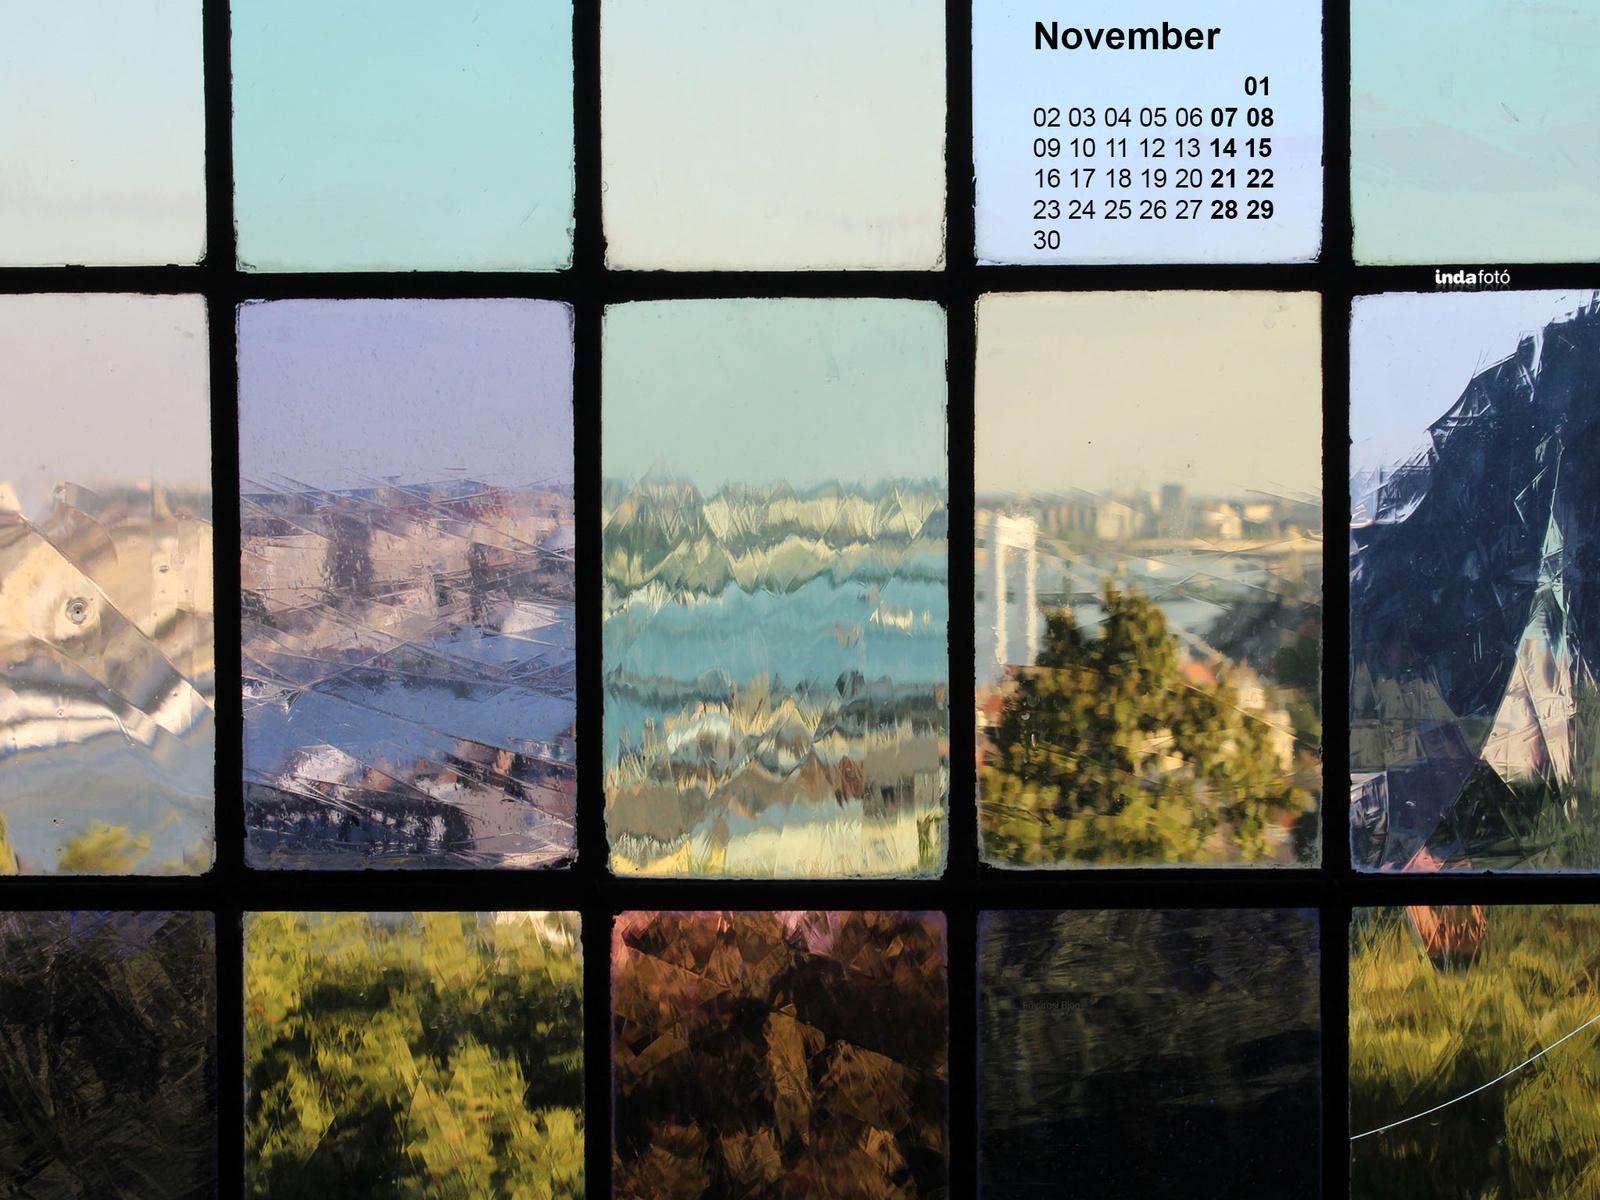 fovarosiblog november indafoto 2048x1536